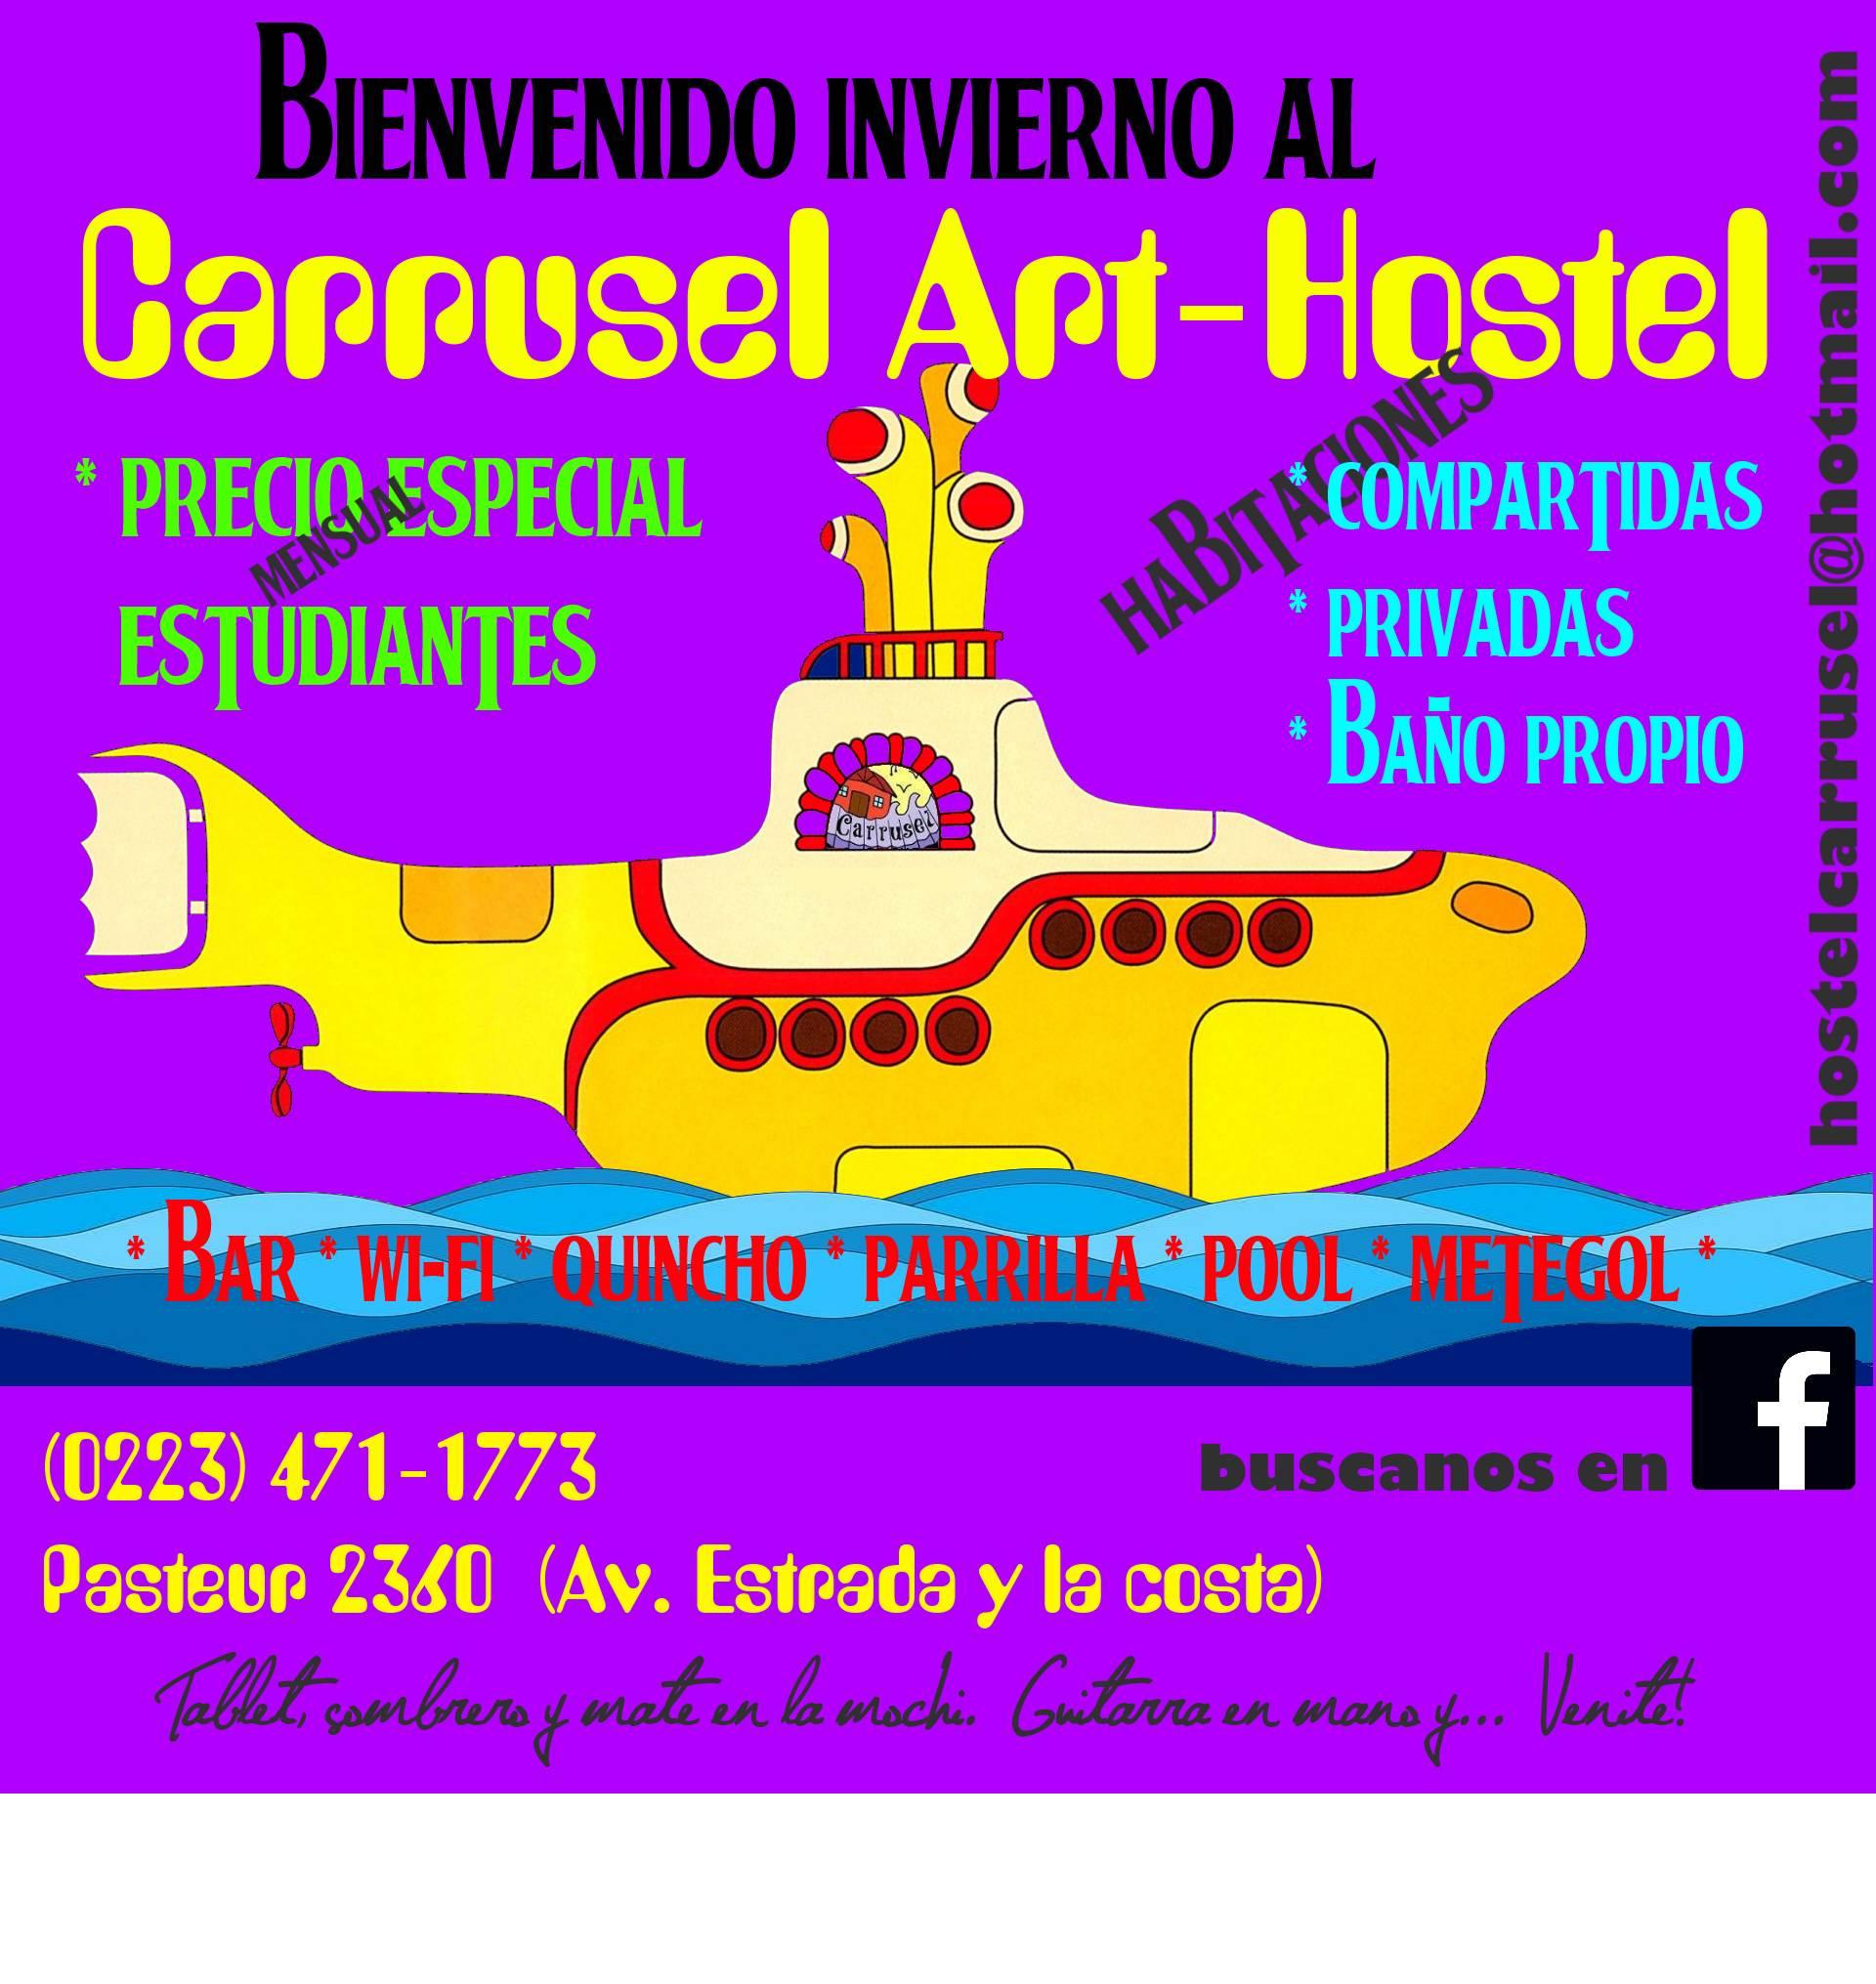 Carrusel Art Hostel